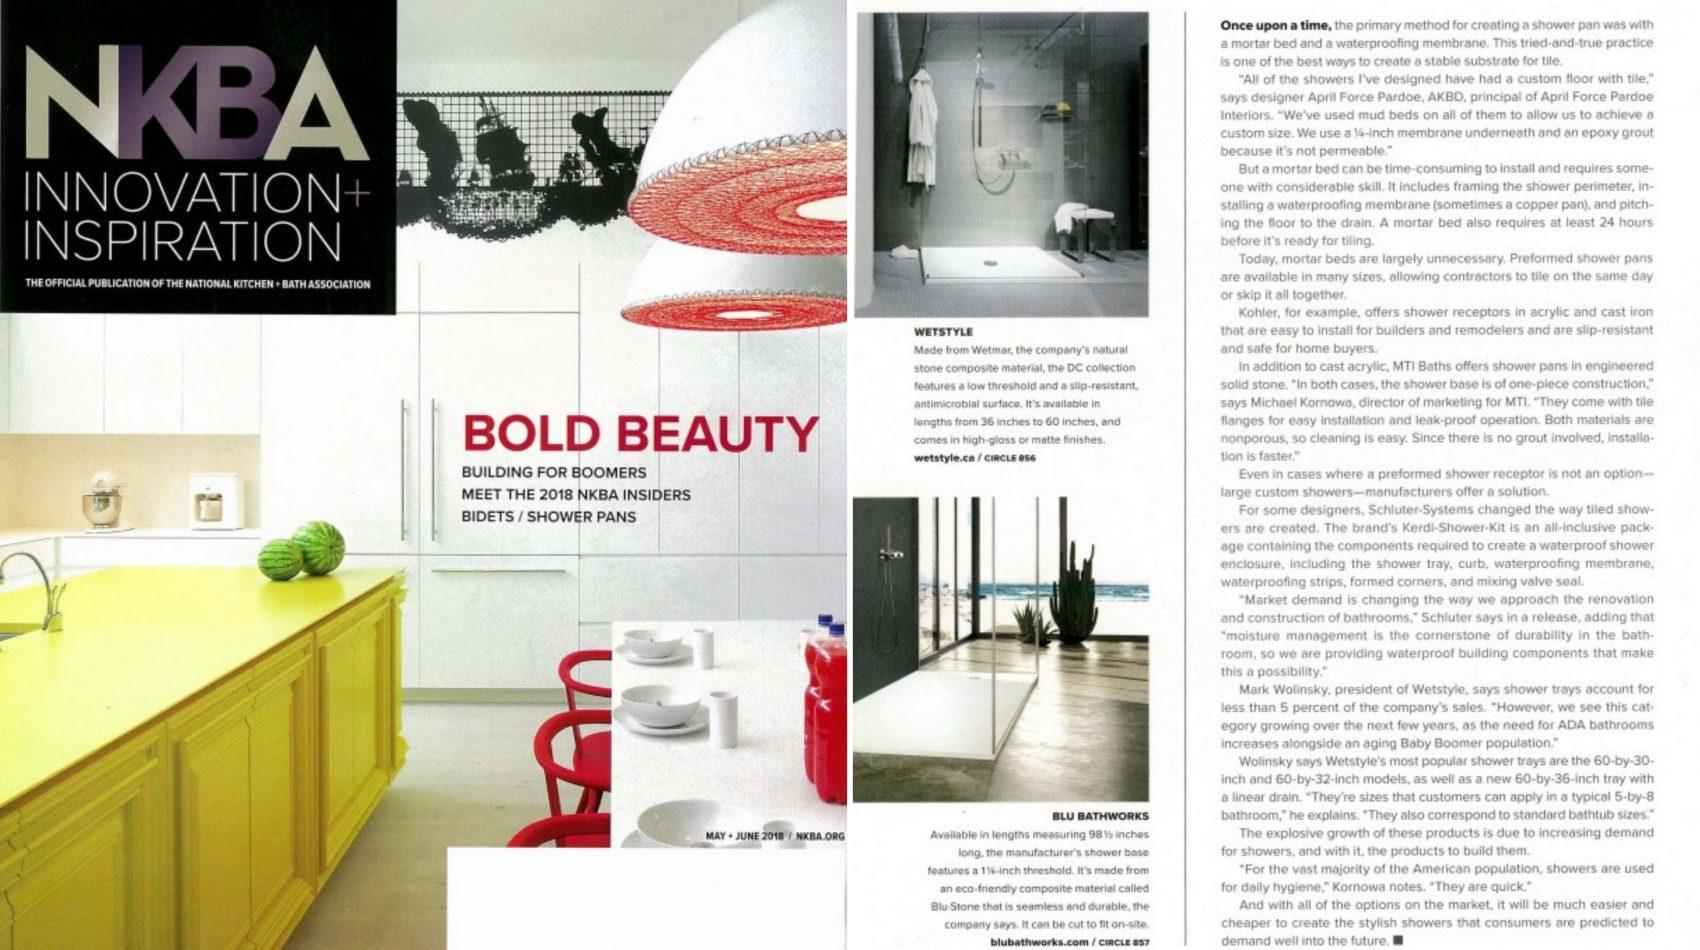 NKBA Innovation inspiration may june 2018 tabloid - shower wetstyle